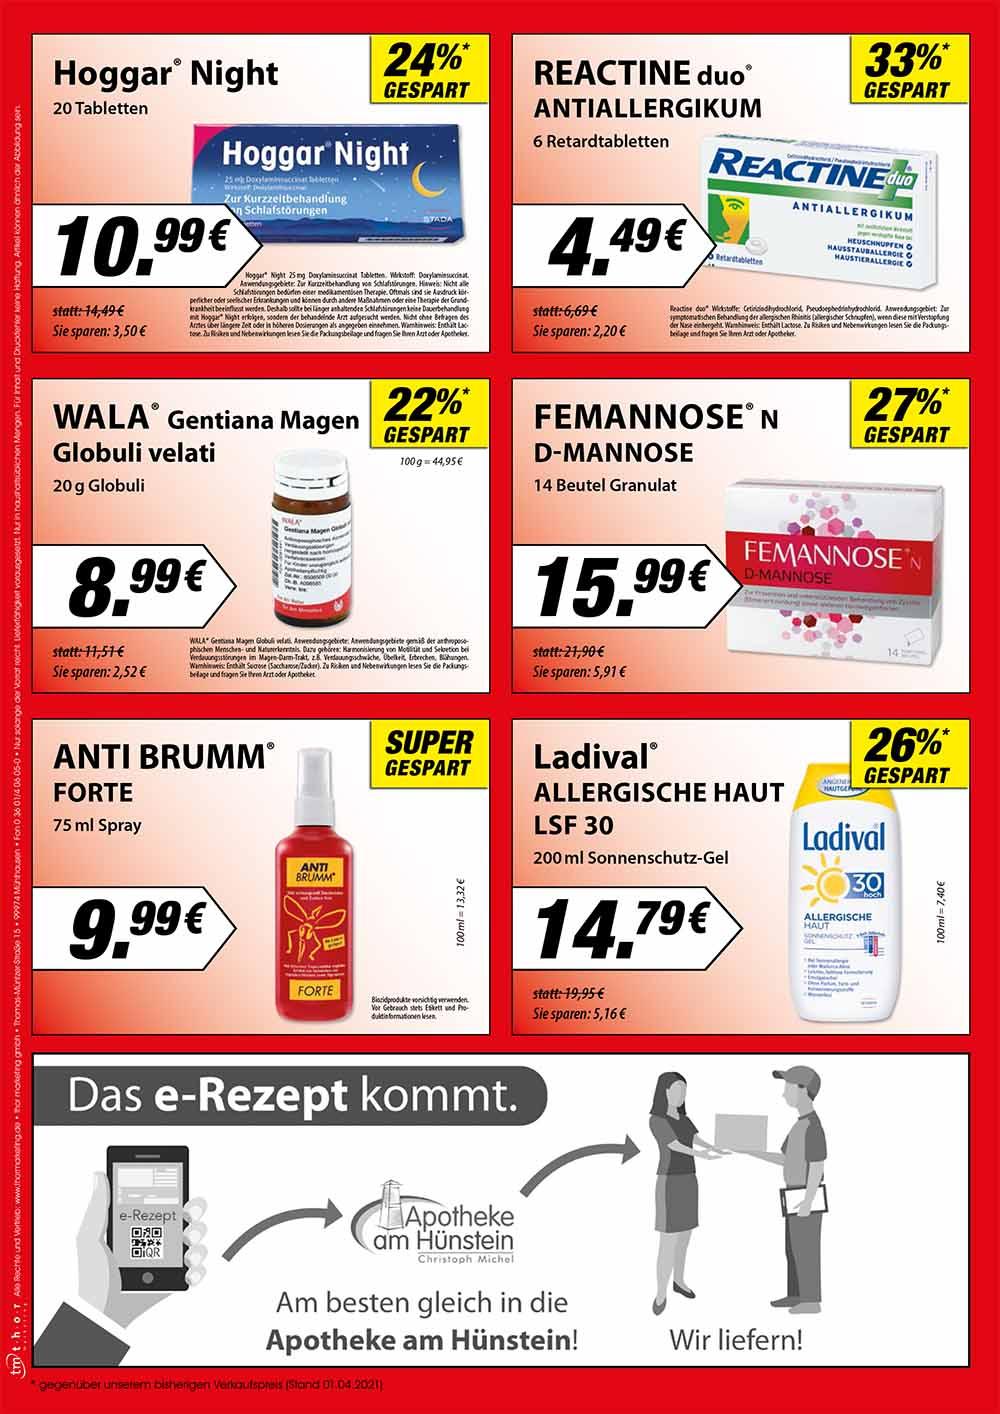 https://www-apotheken-de.apocdn.net/fileadmin/clubarea/00000-Angebote/35232_11932_am_huenstein_angebot_4.jpg